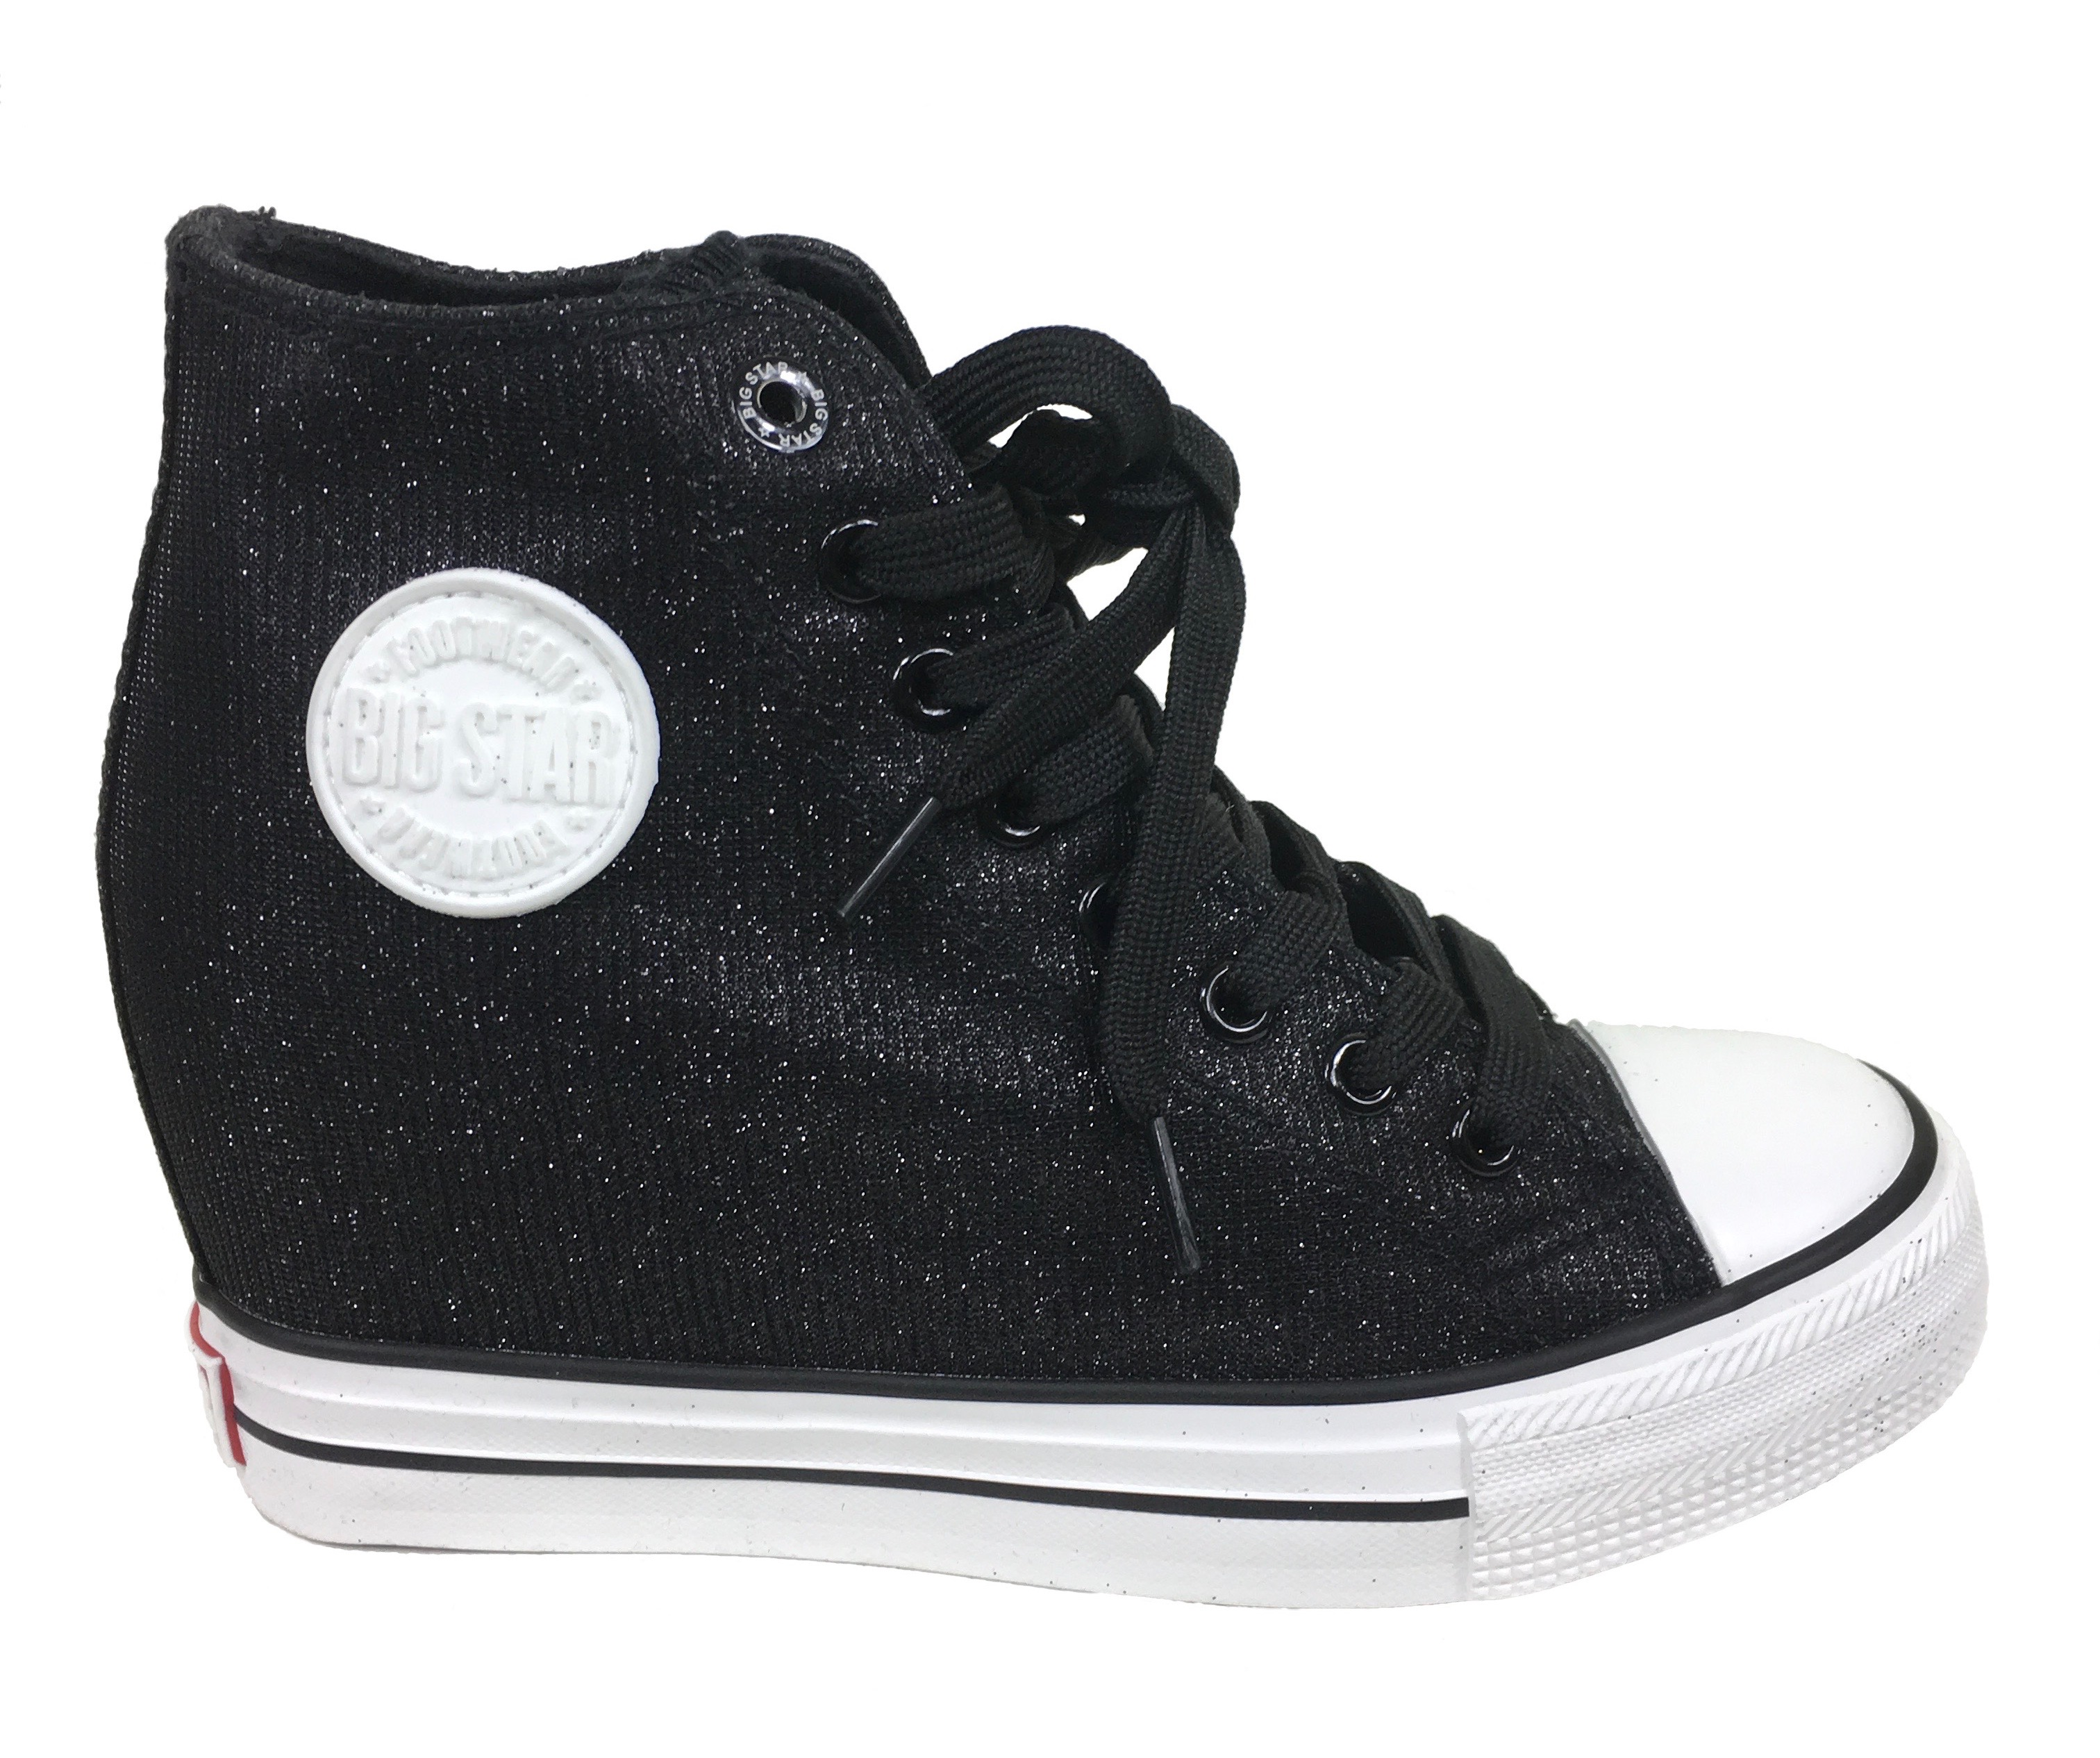 Dámské boty tenisky BIG STAR černé W274674 - Glami.cz bbbc55b610